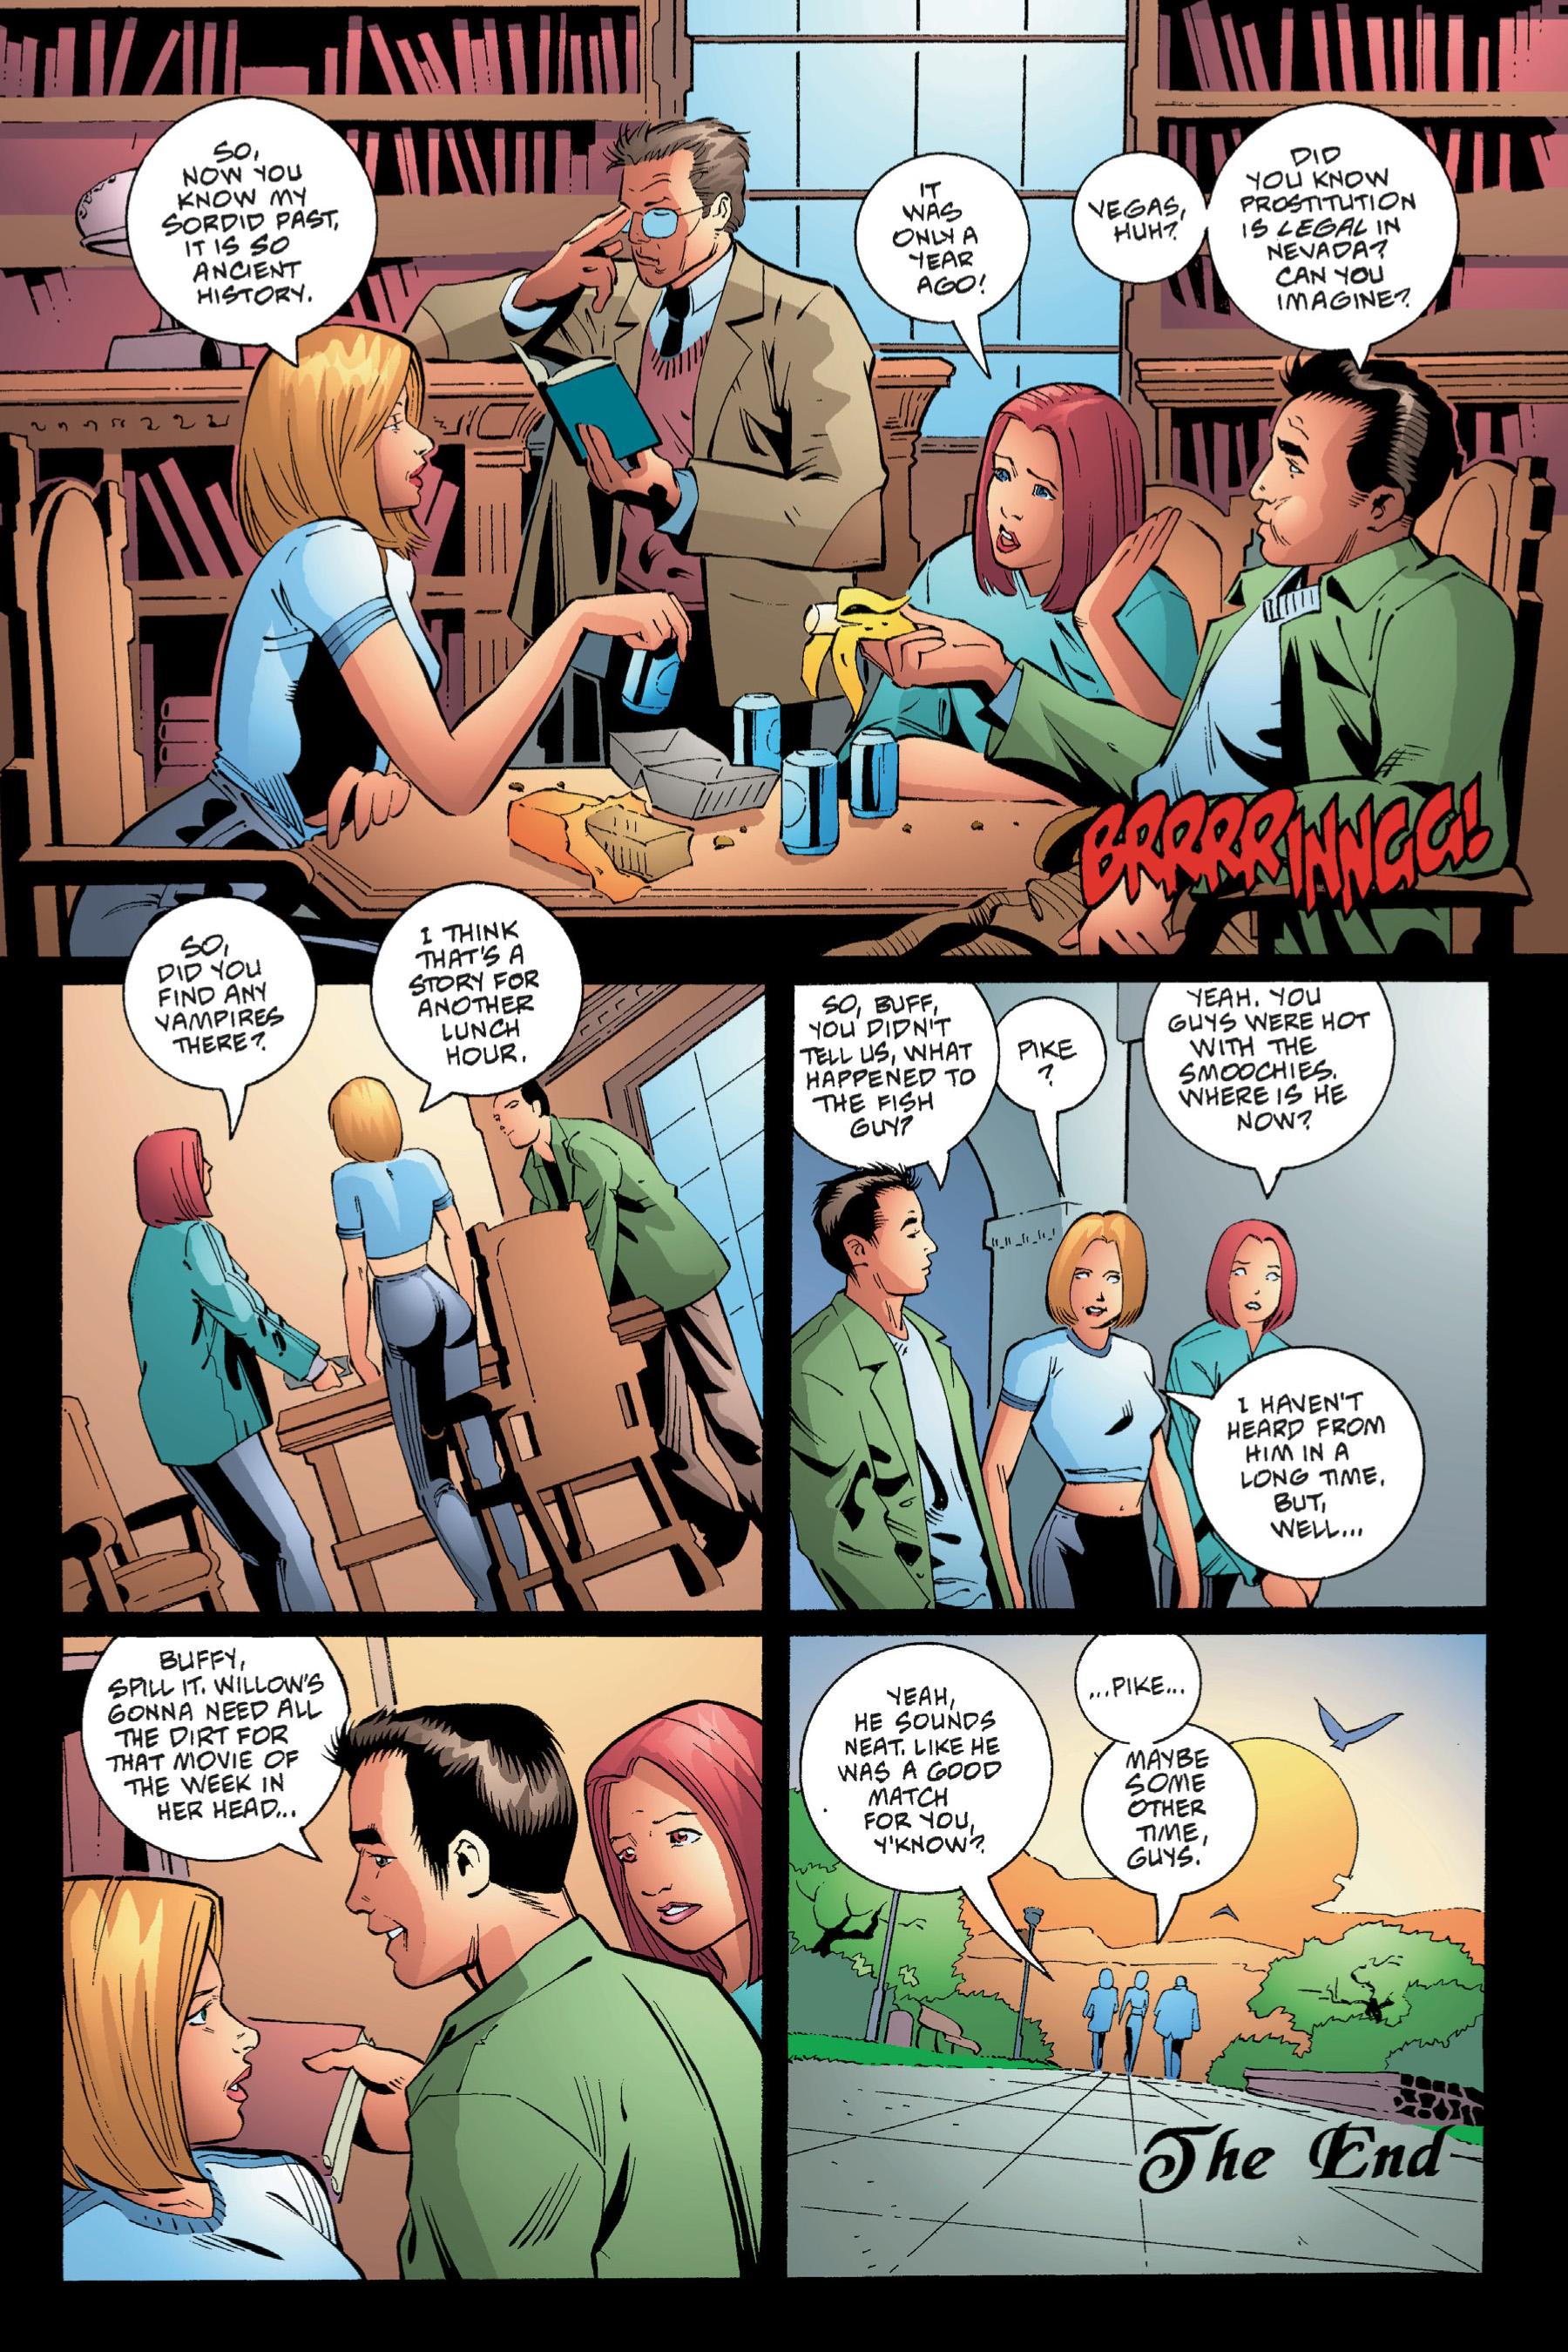 Read online Buffy the Vampire Slayer: Omnibus comic -  Issue # TPB 1 - 102